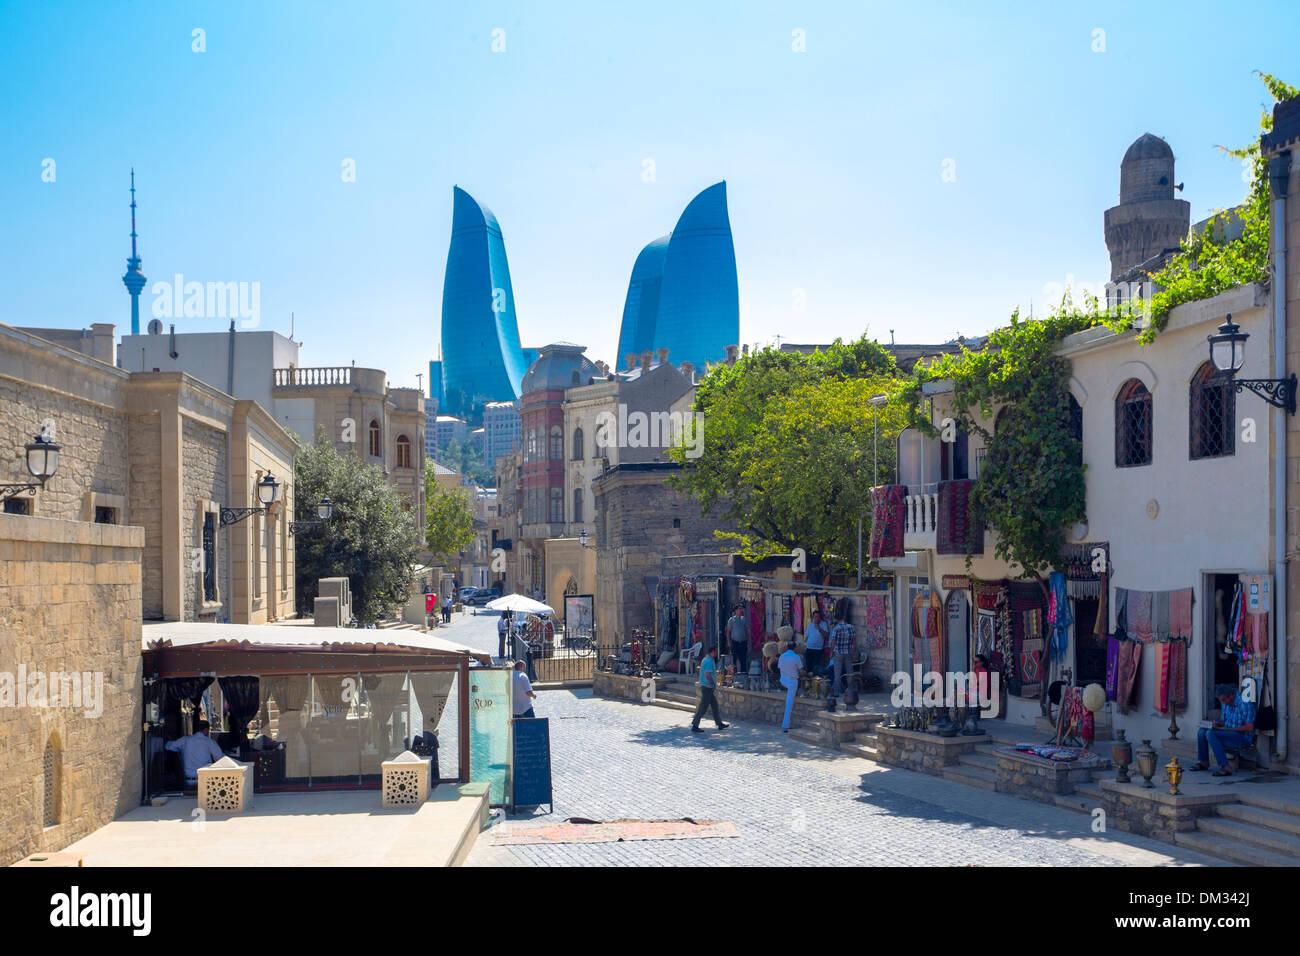 world heritage Azerbaijan Caucasus Eurasia Baku City Flame Old Baku architecture shops skyline street tourists towers travel - Stock Image